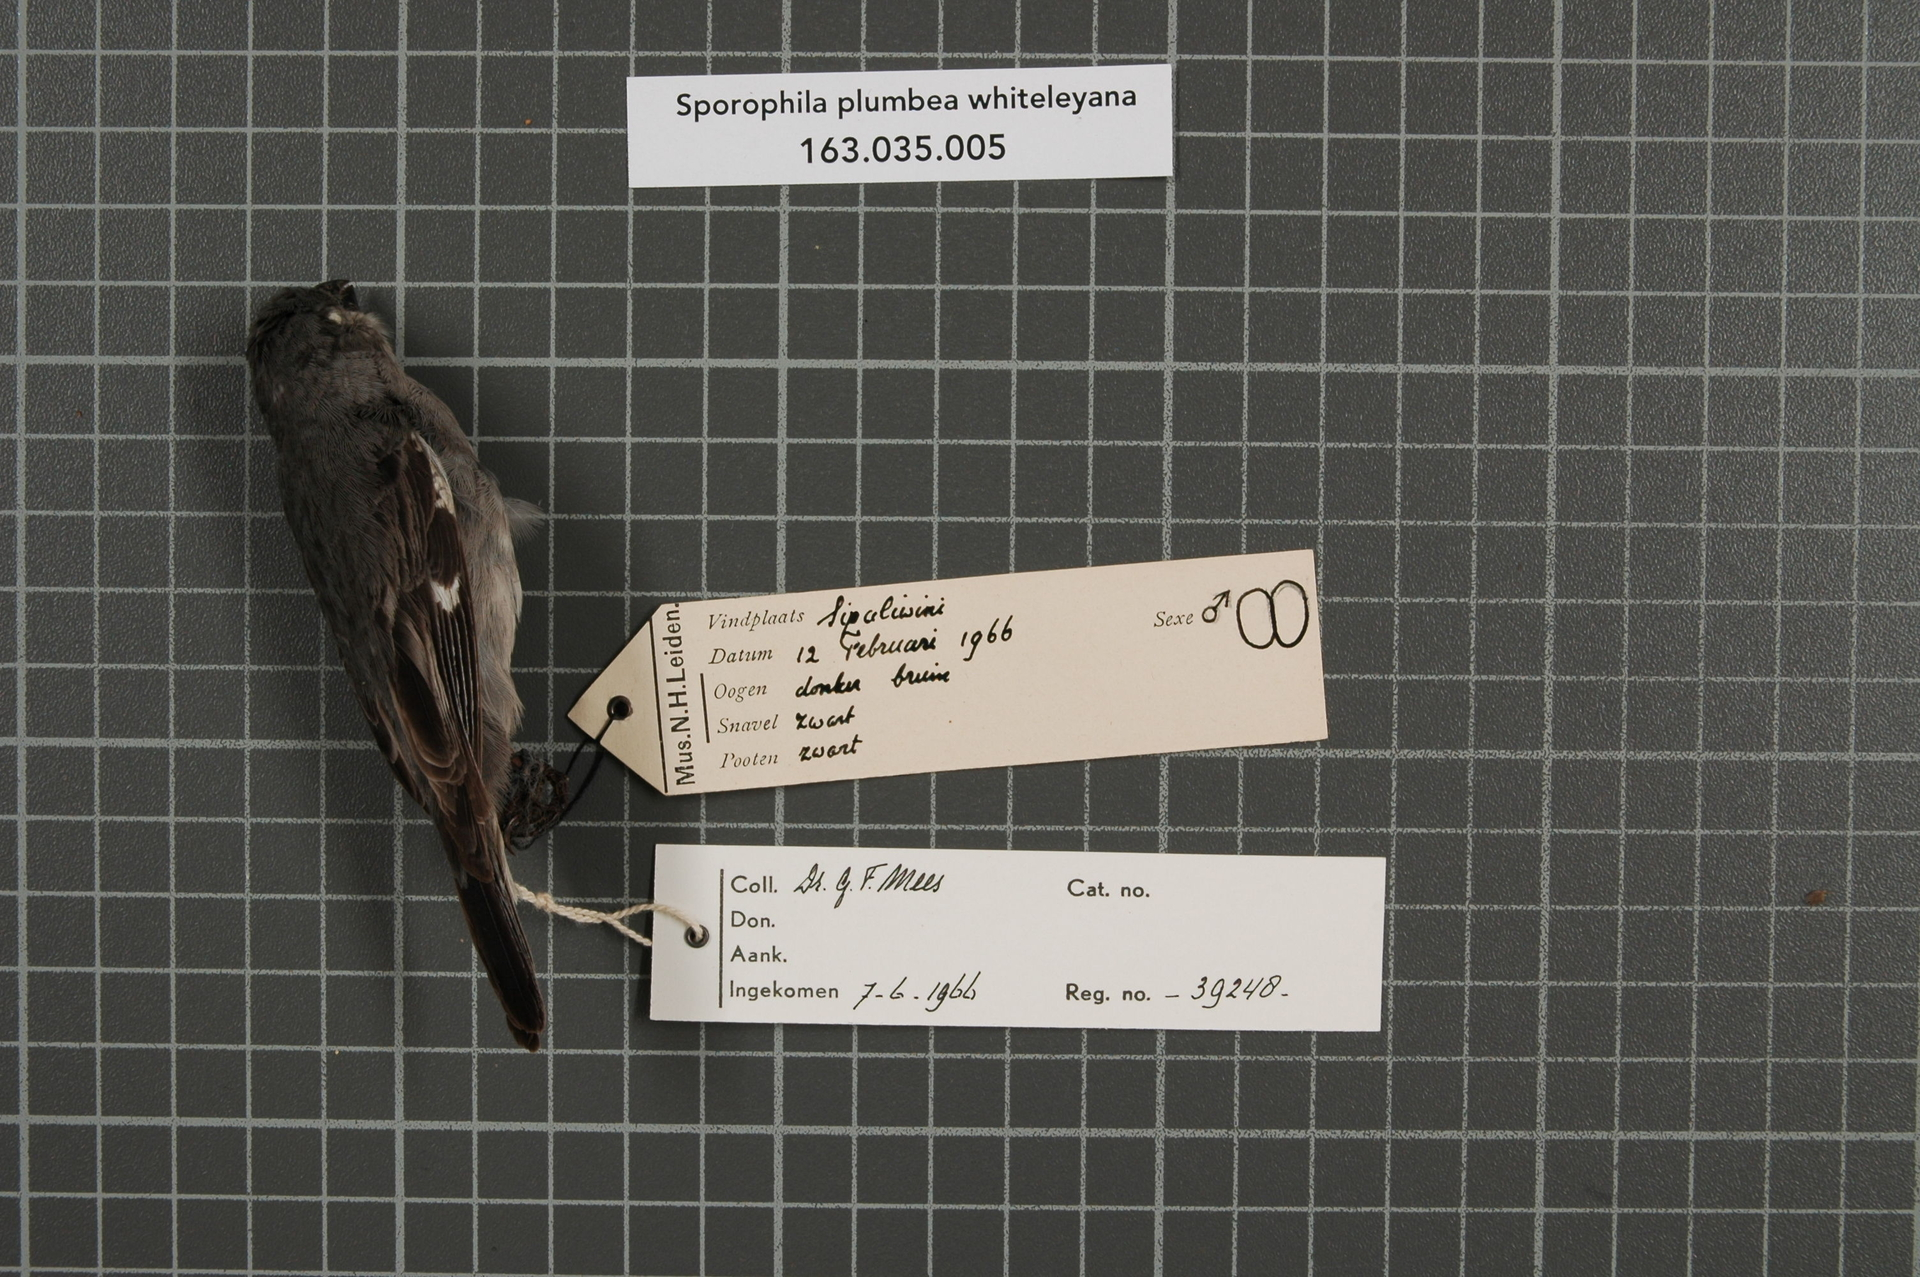 RMNH.AVES.39248 | Sporophila plumbea whiteleyana (Sharpe, 1888)